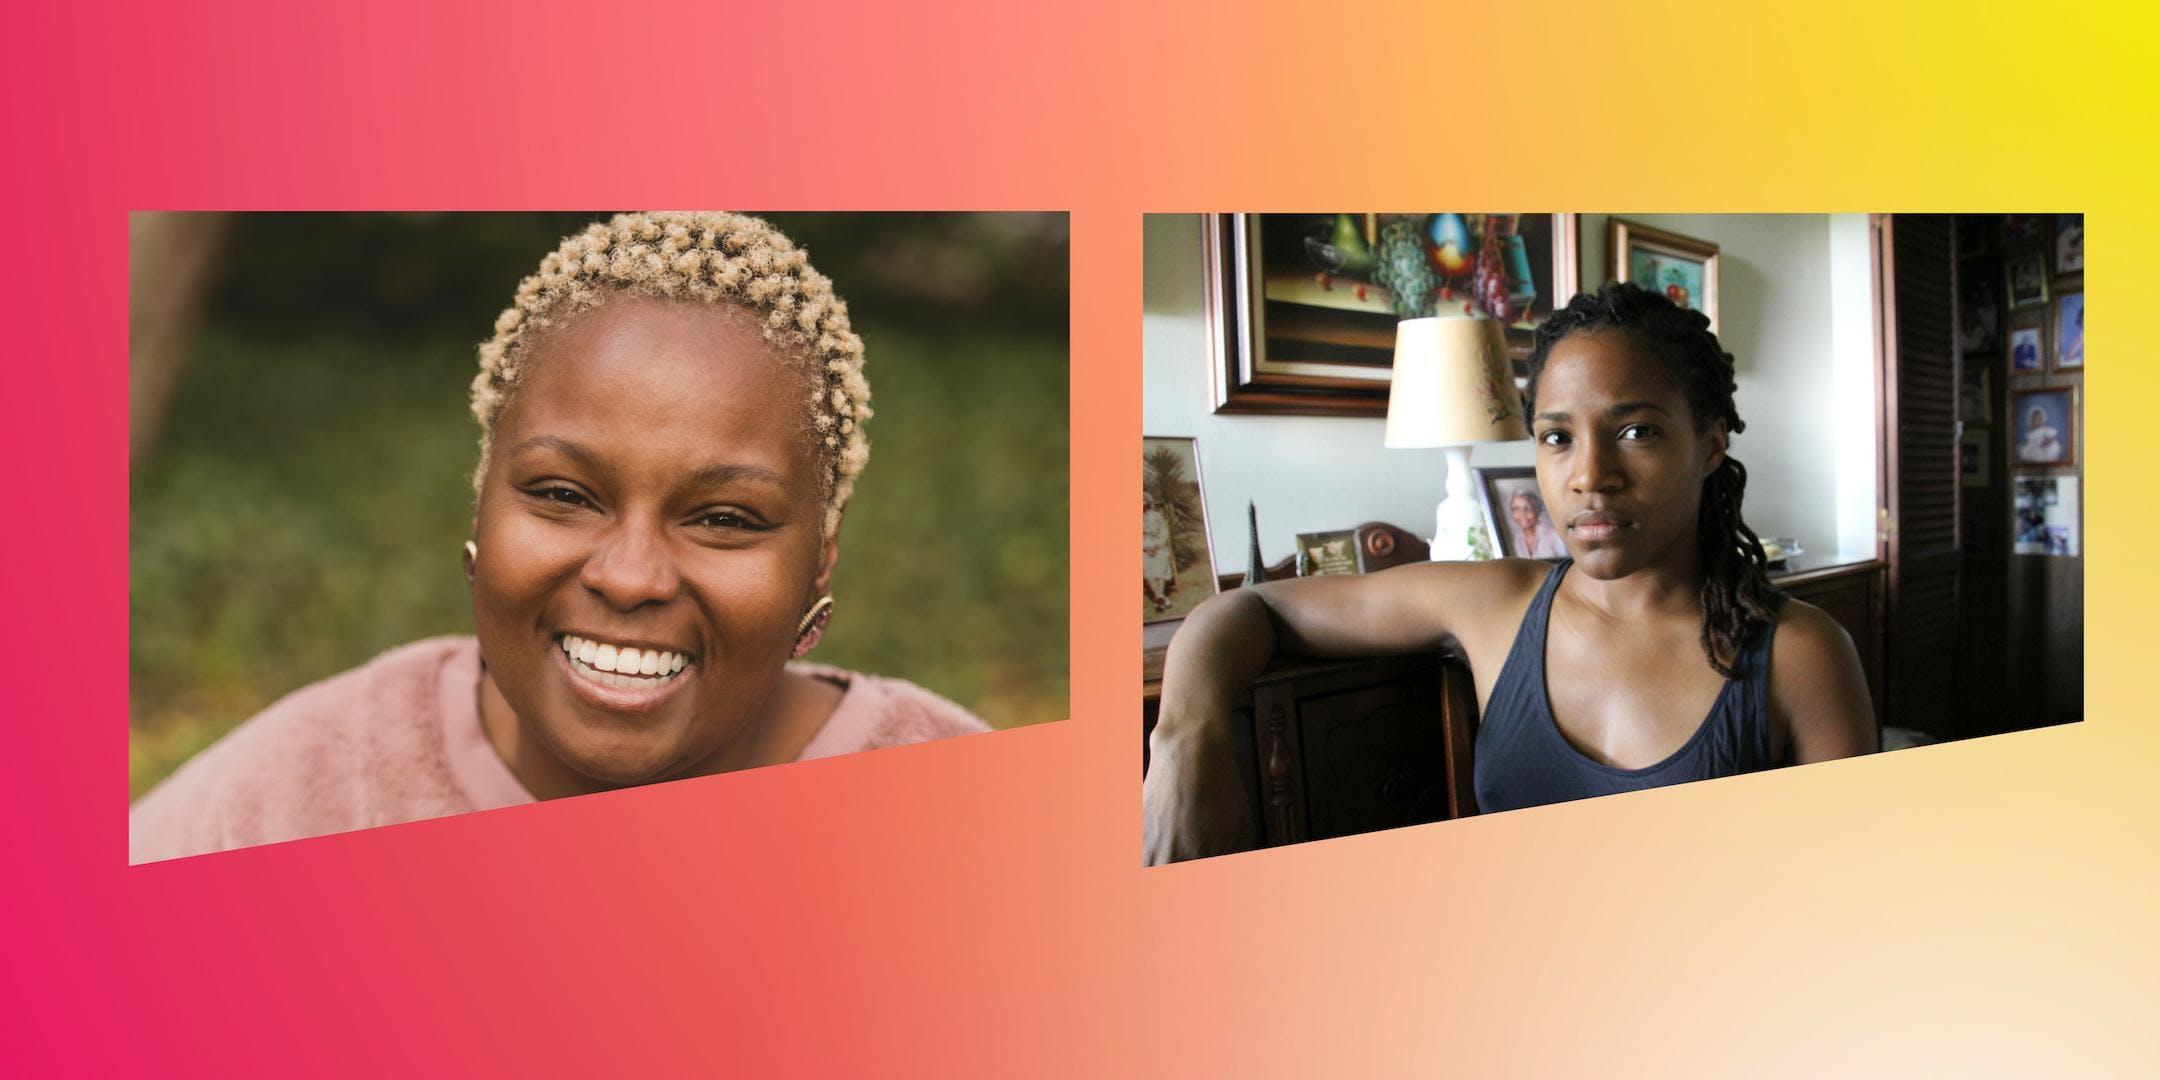 Literary Landscapes: Keeonna Harris & Saretta Morgan